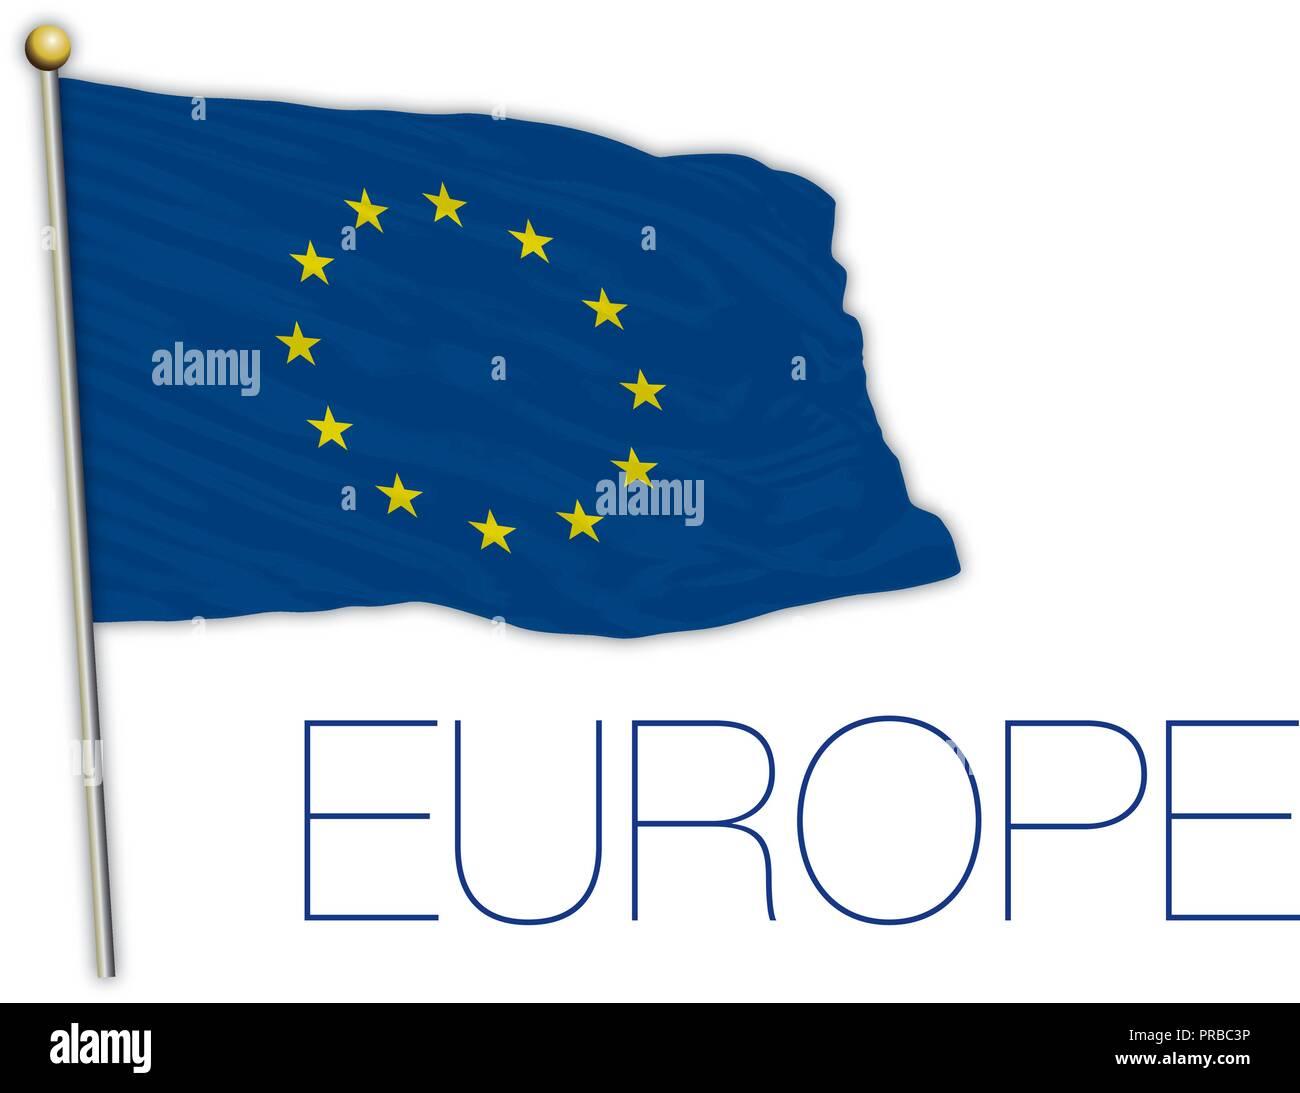 European Union flag, vector illustration - Stock Image